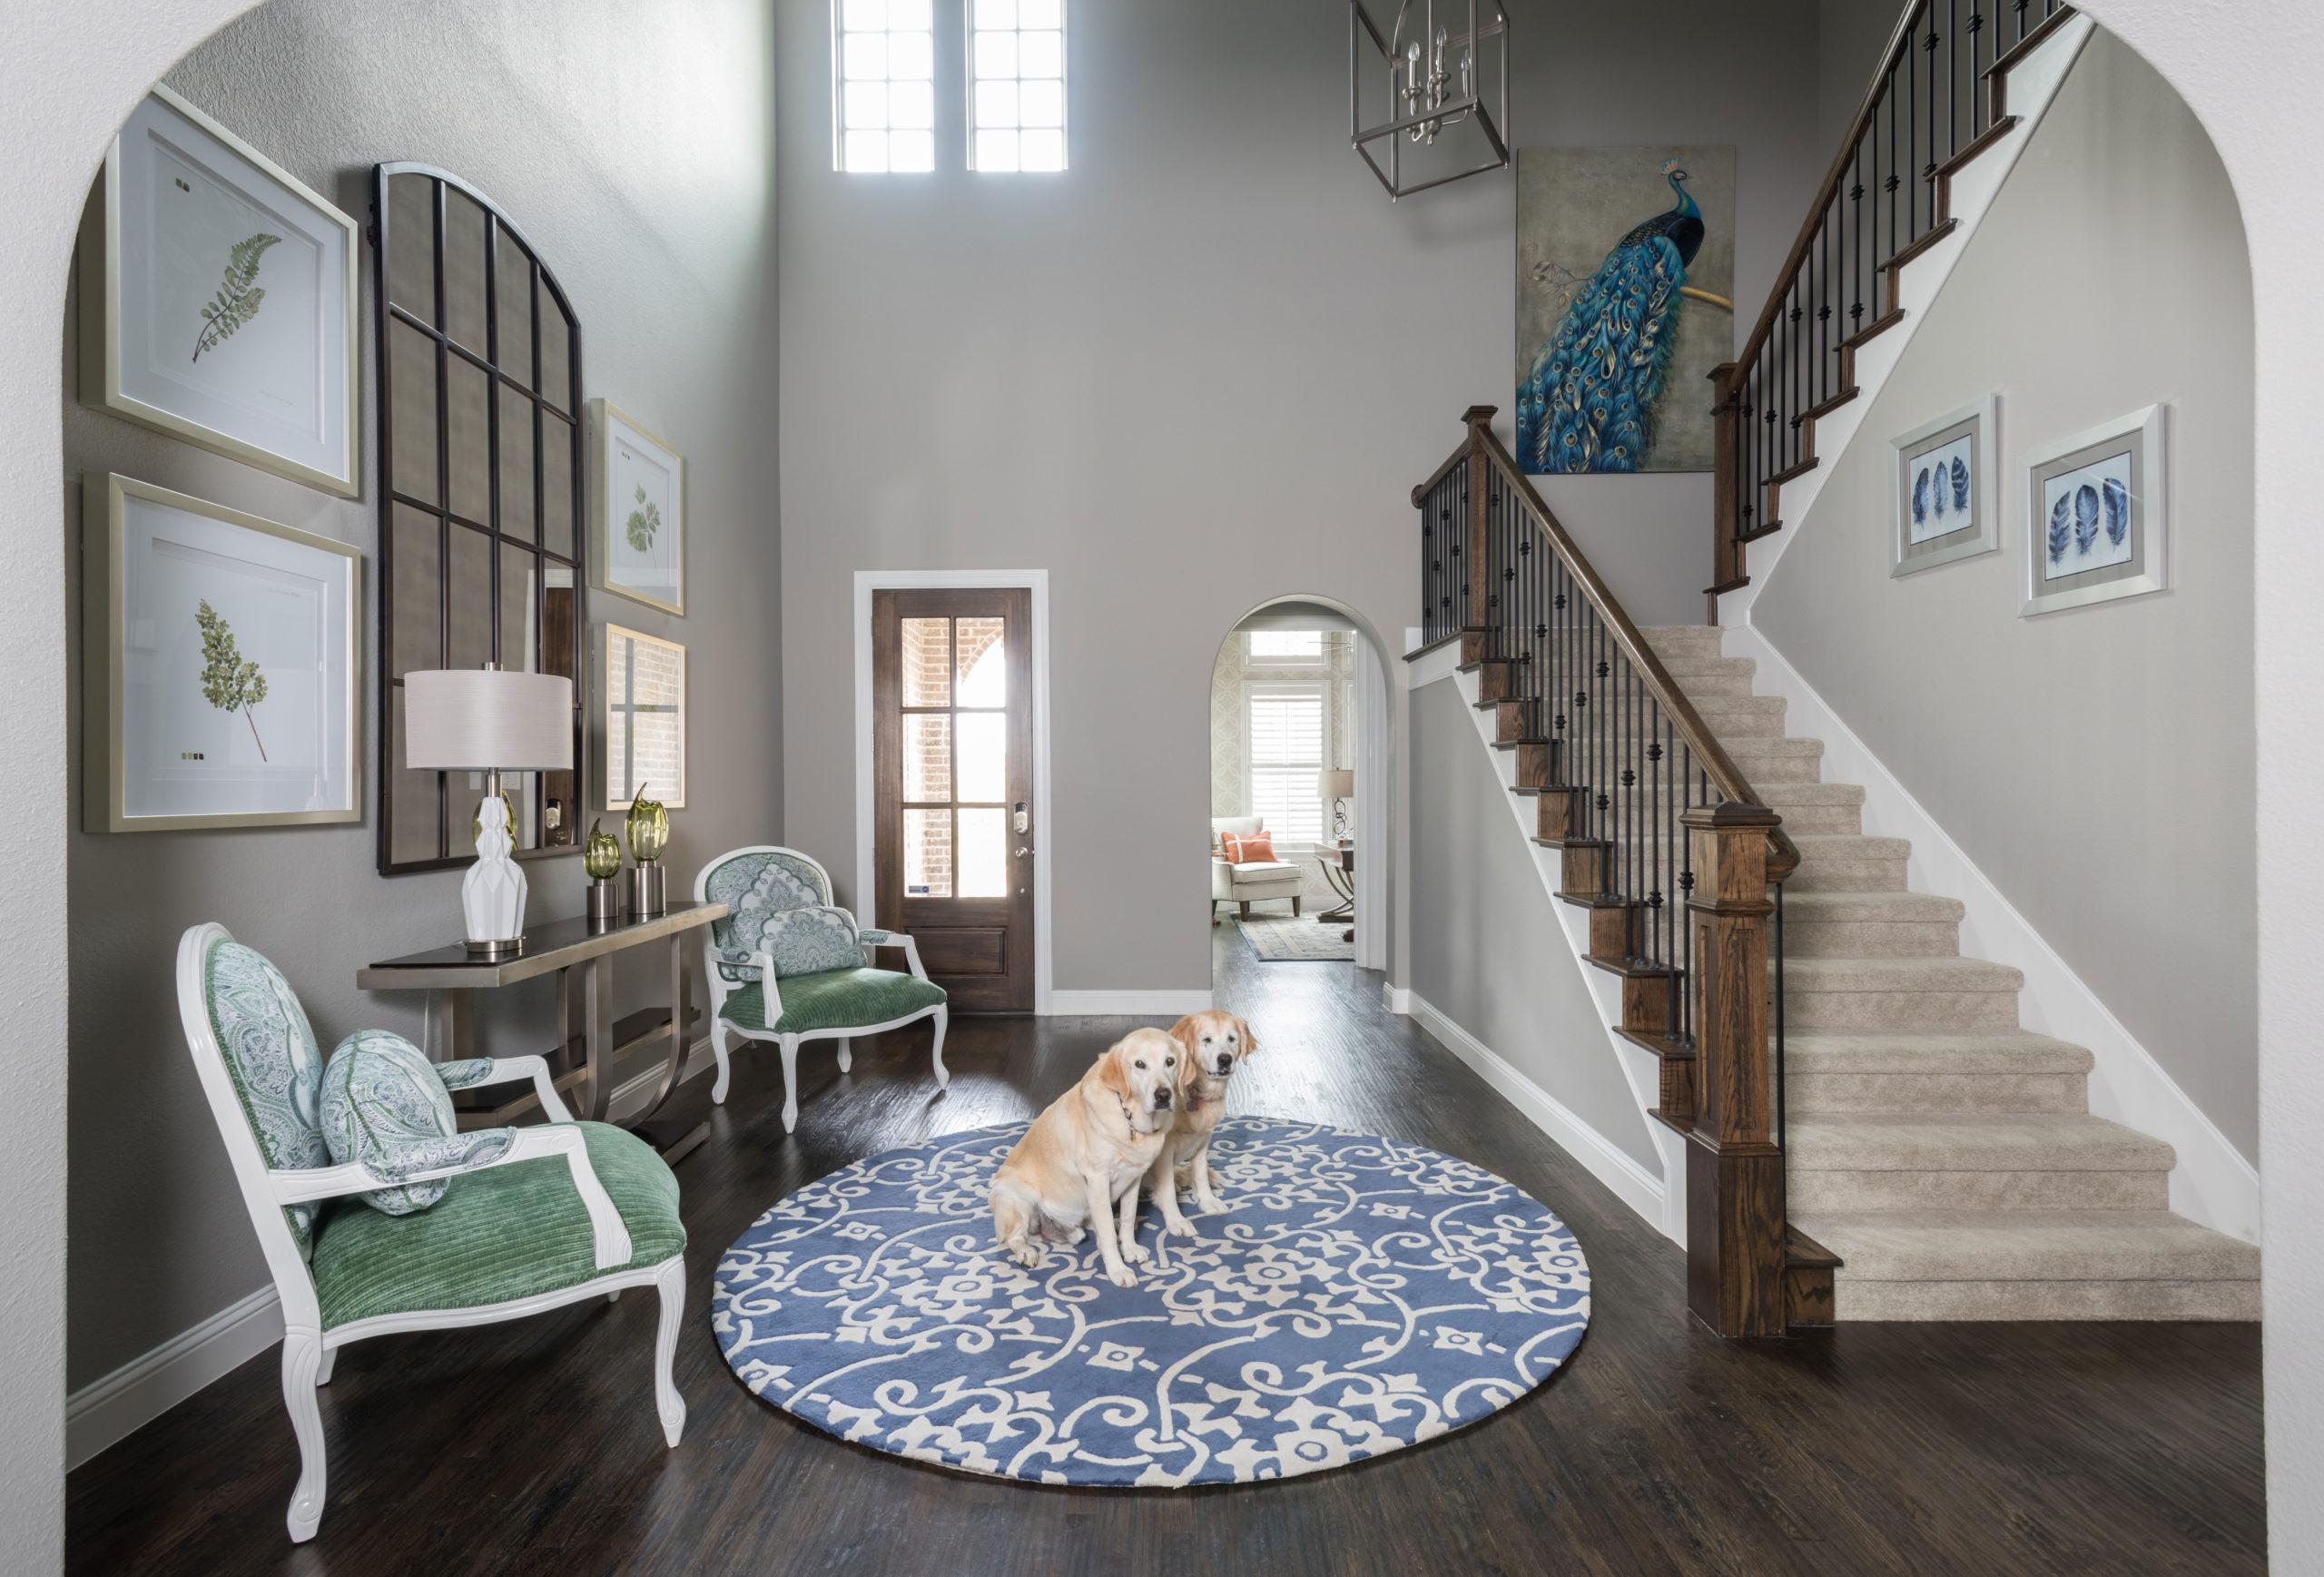 Currently Dream Room 2018 4 - Dallas Interior Designer serving Plano, Frisco, Dallas, Allen for Decorating Den Interiors D'KOR HOME by Dee Frazier Interiors